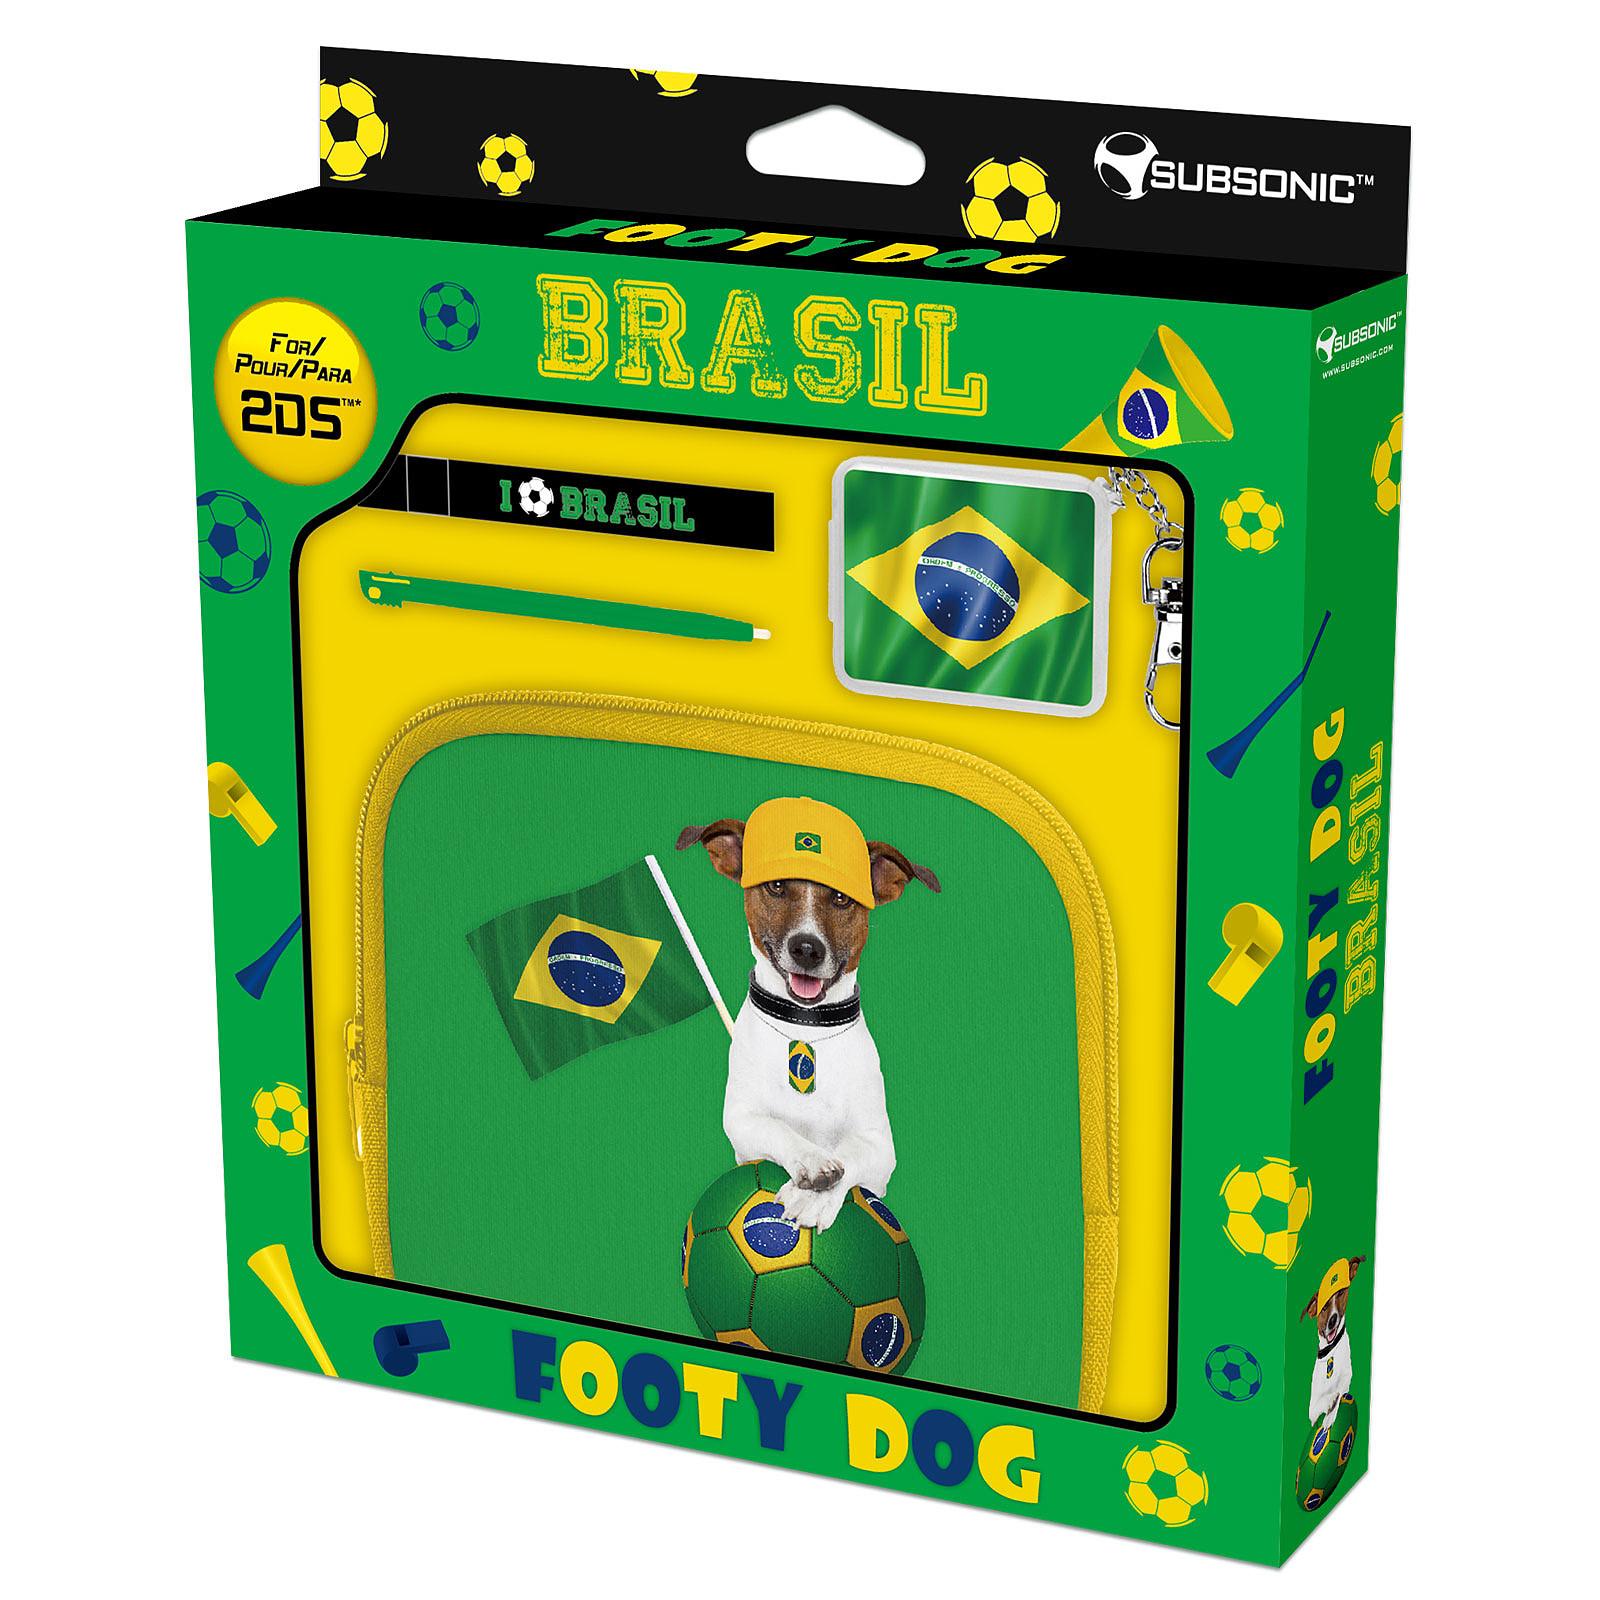 Subsonic Footy Dog Brazil (Nintendo 2DS)